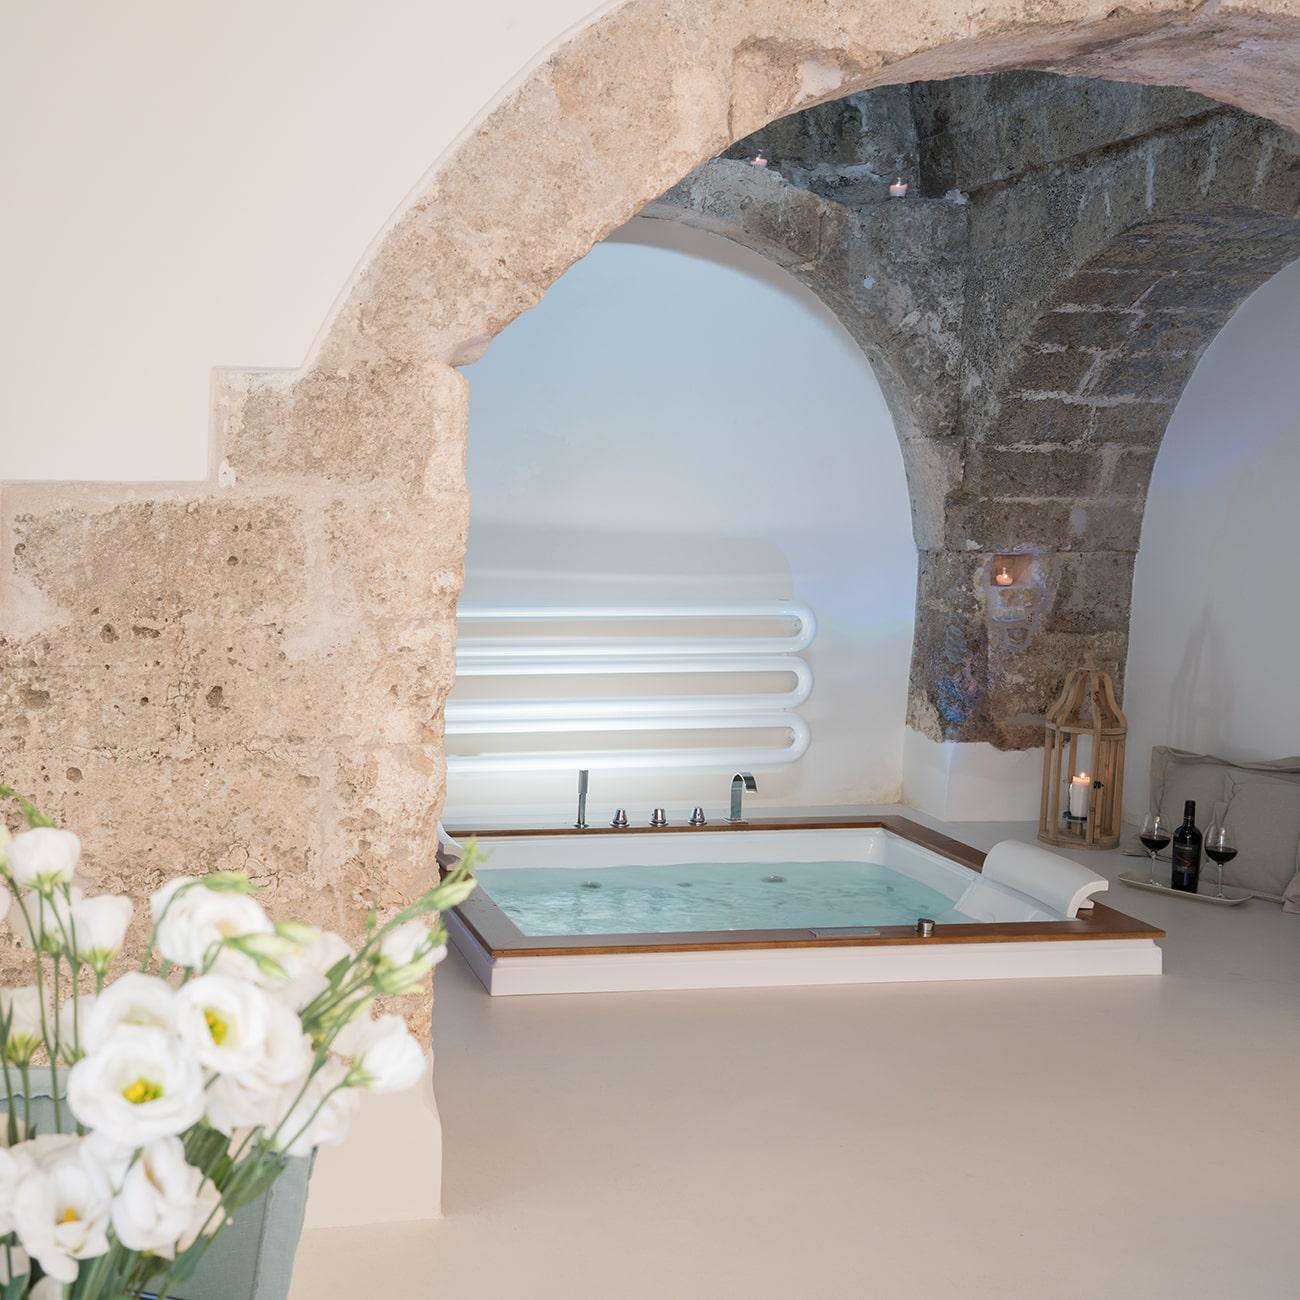 Masseria Amastuola: Suite Ovile con vasca idromassaggio